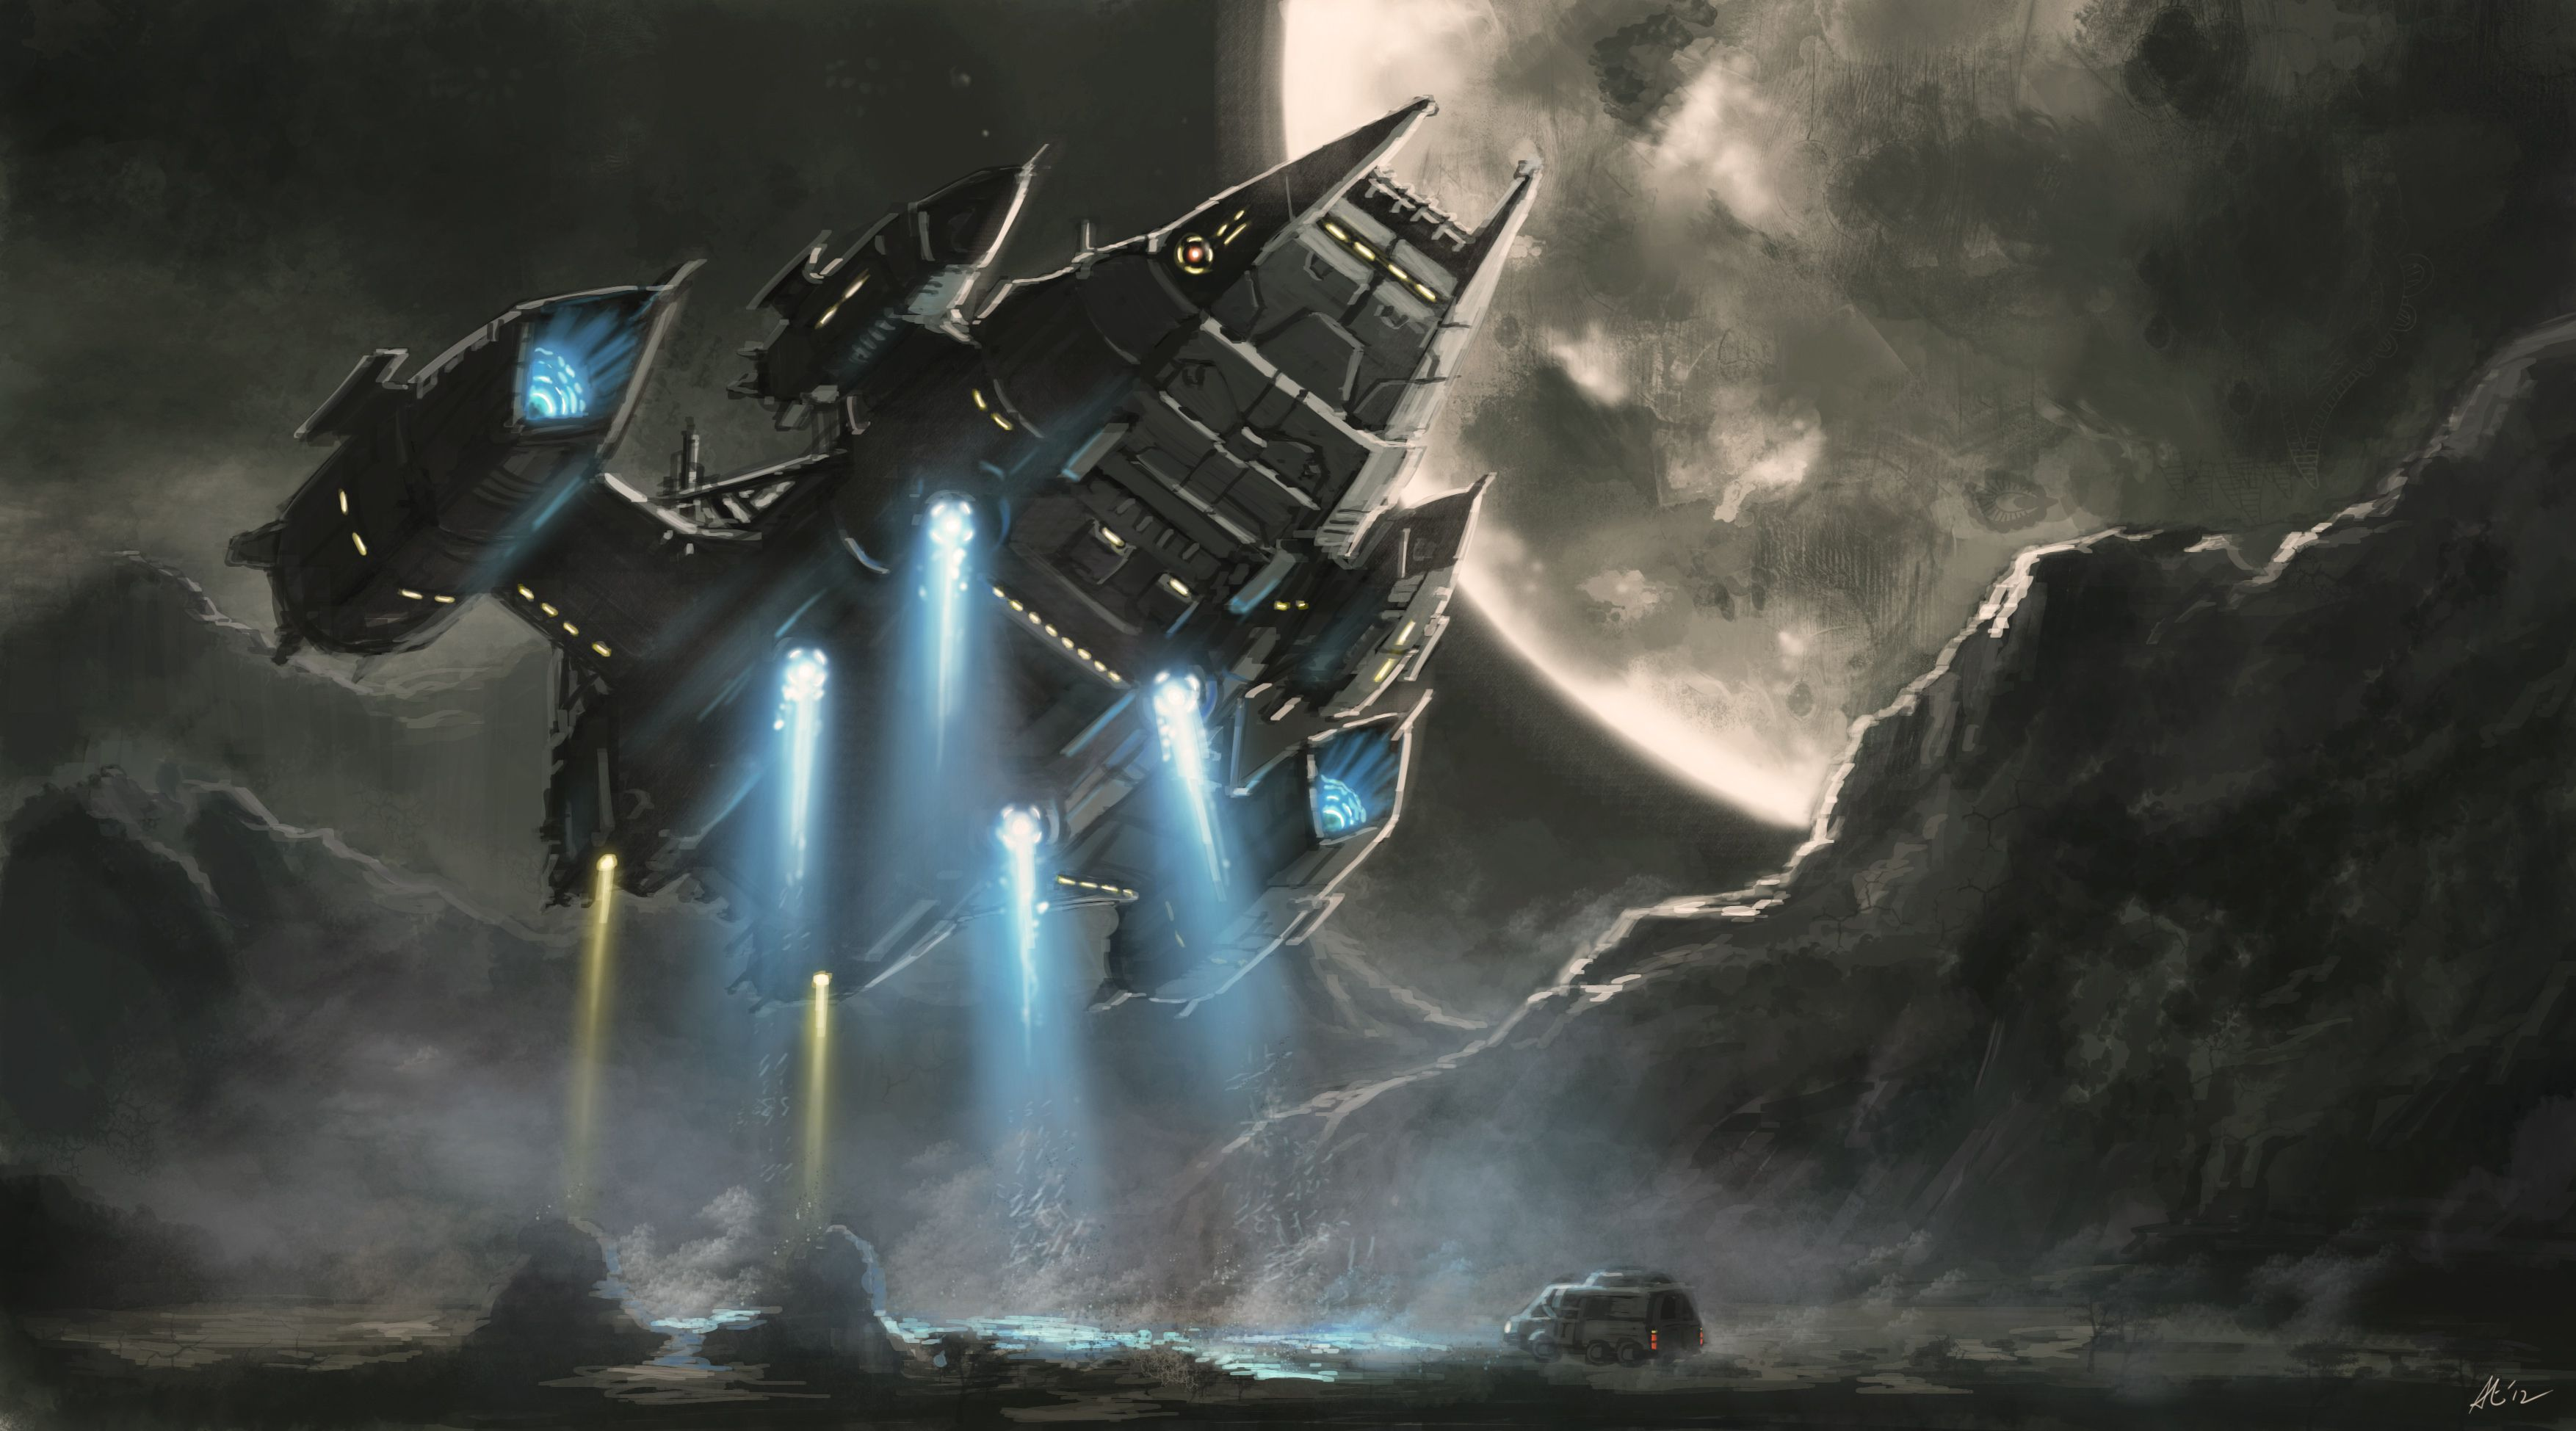 http://all-images.net/wallpaper-science-fiction-hd-fond-ecran-03/